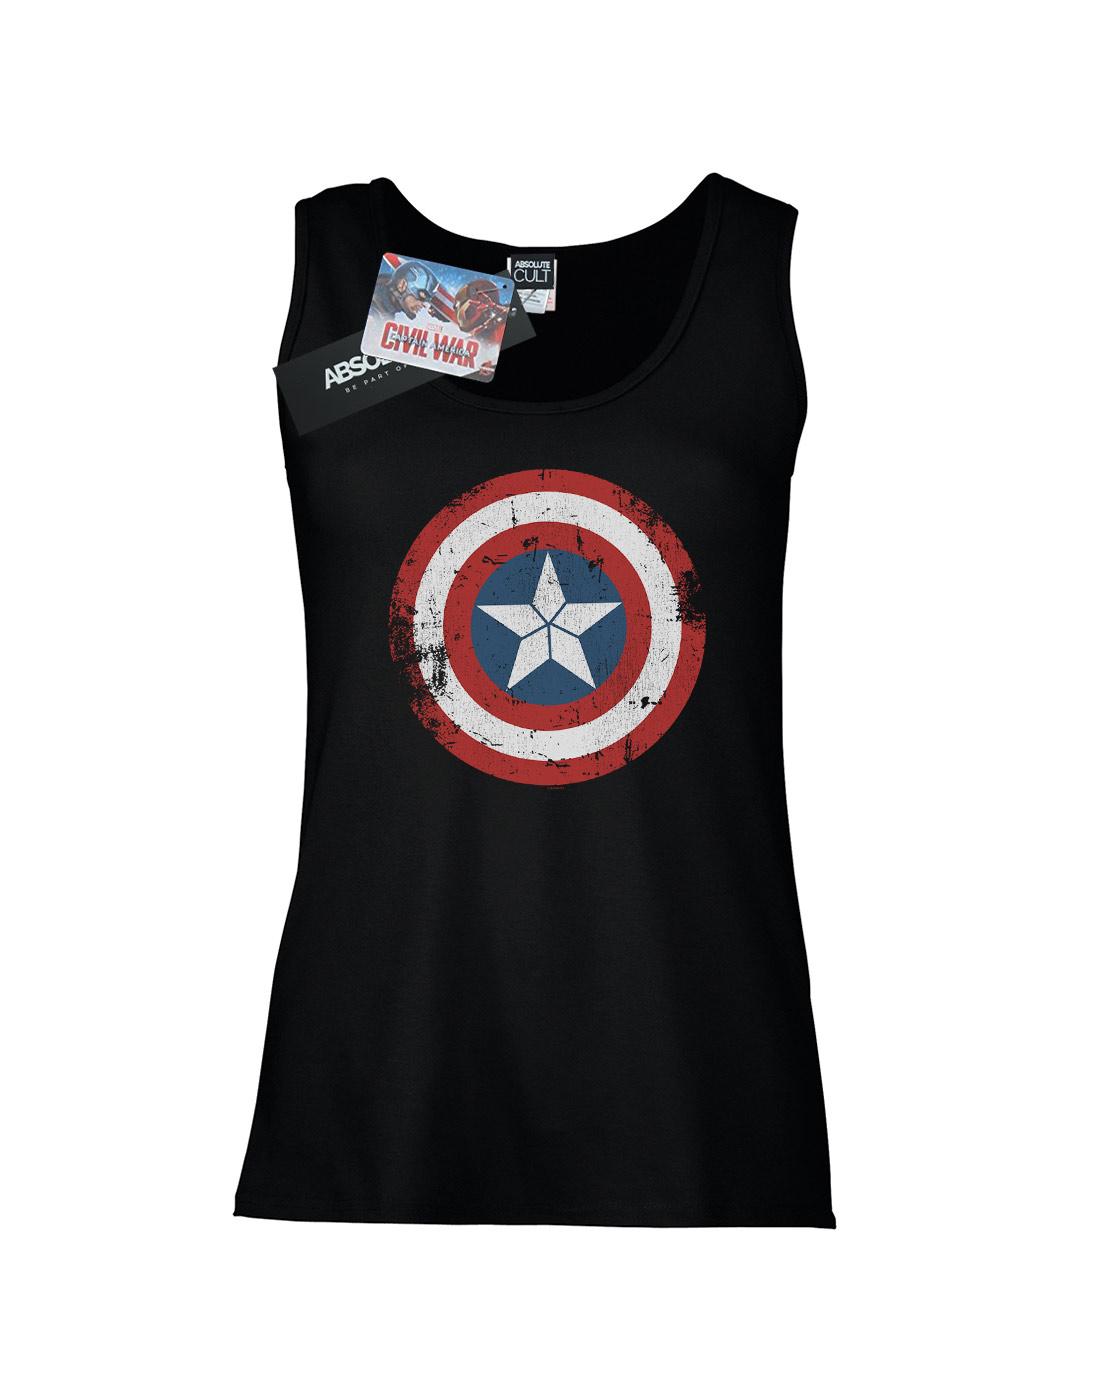 180c8ef2b0585 Marvel Women s Captain America Civil War Distressed Shield Tank Top ...